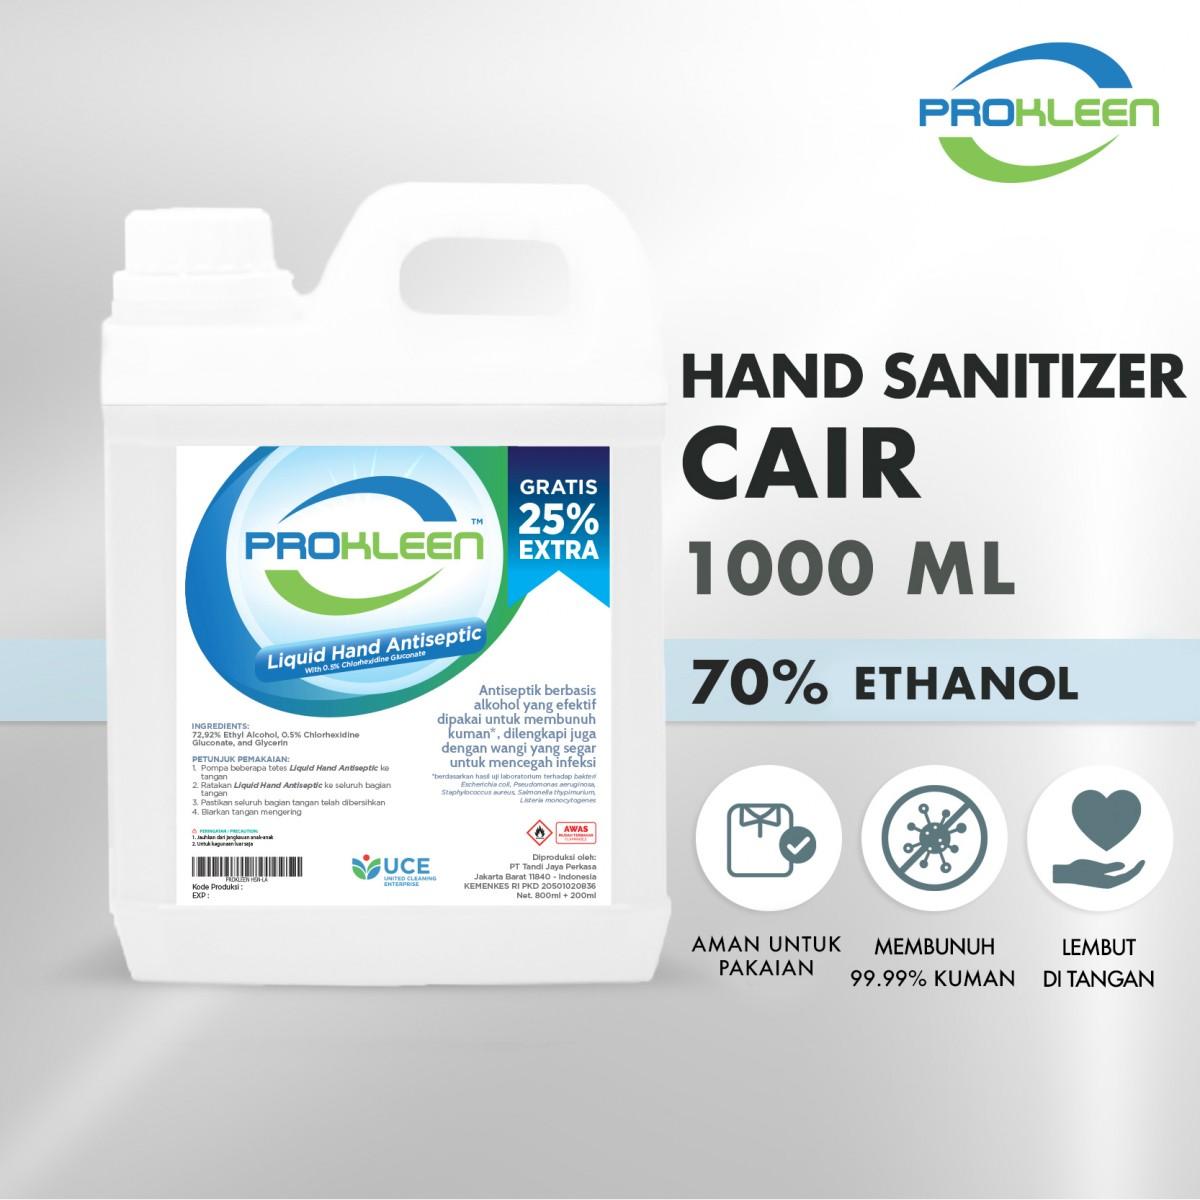 Hand Sanitizer CAIR 70% Food Grade PROKLEEN 1000mL NON FOOD GRADE - United Cleaning Enterprise